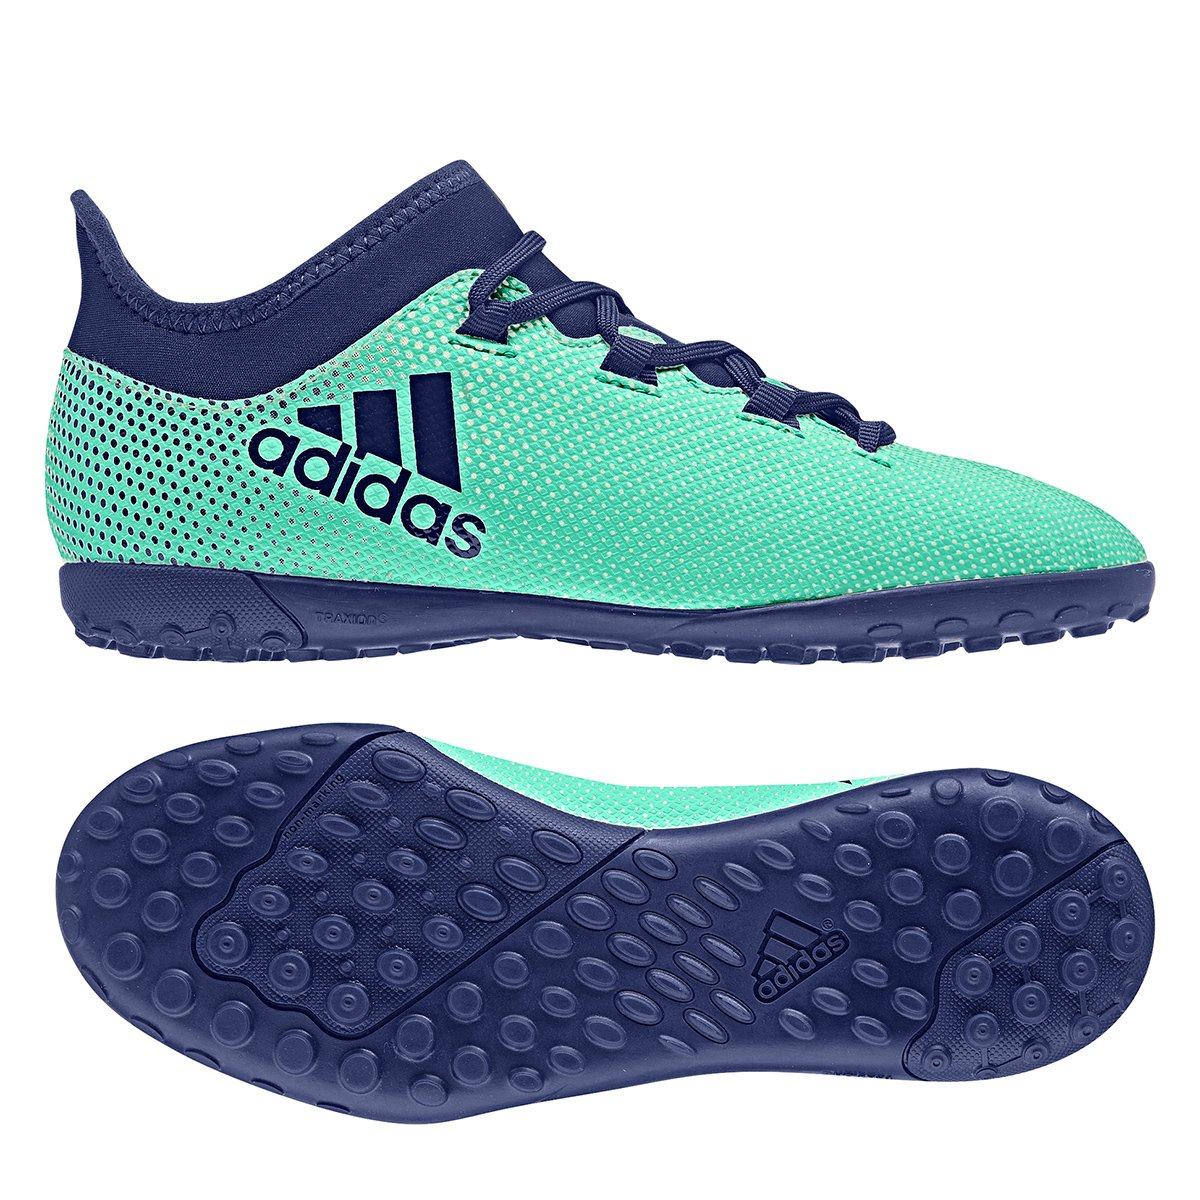 c341a949c5f8f Chuteira Society Infantil Adidas X 17.3 TF - Compre Agora